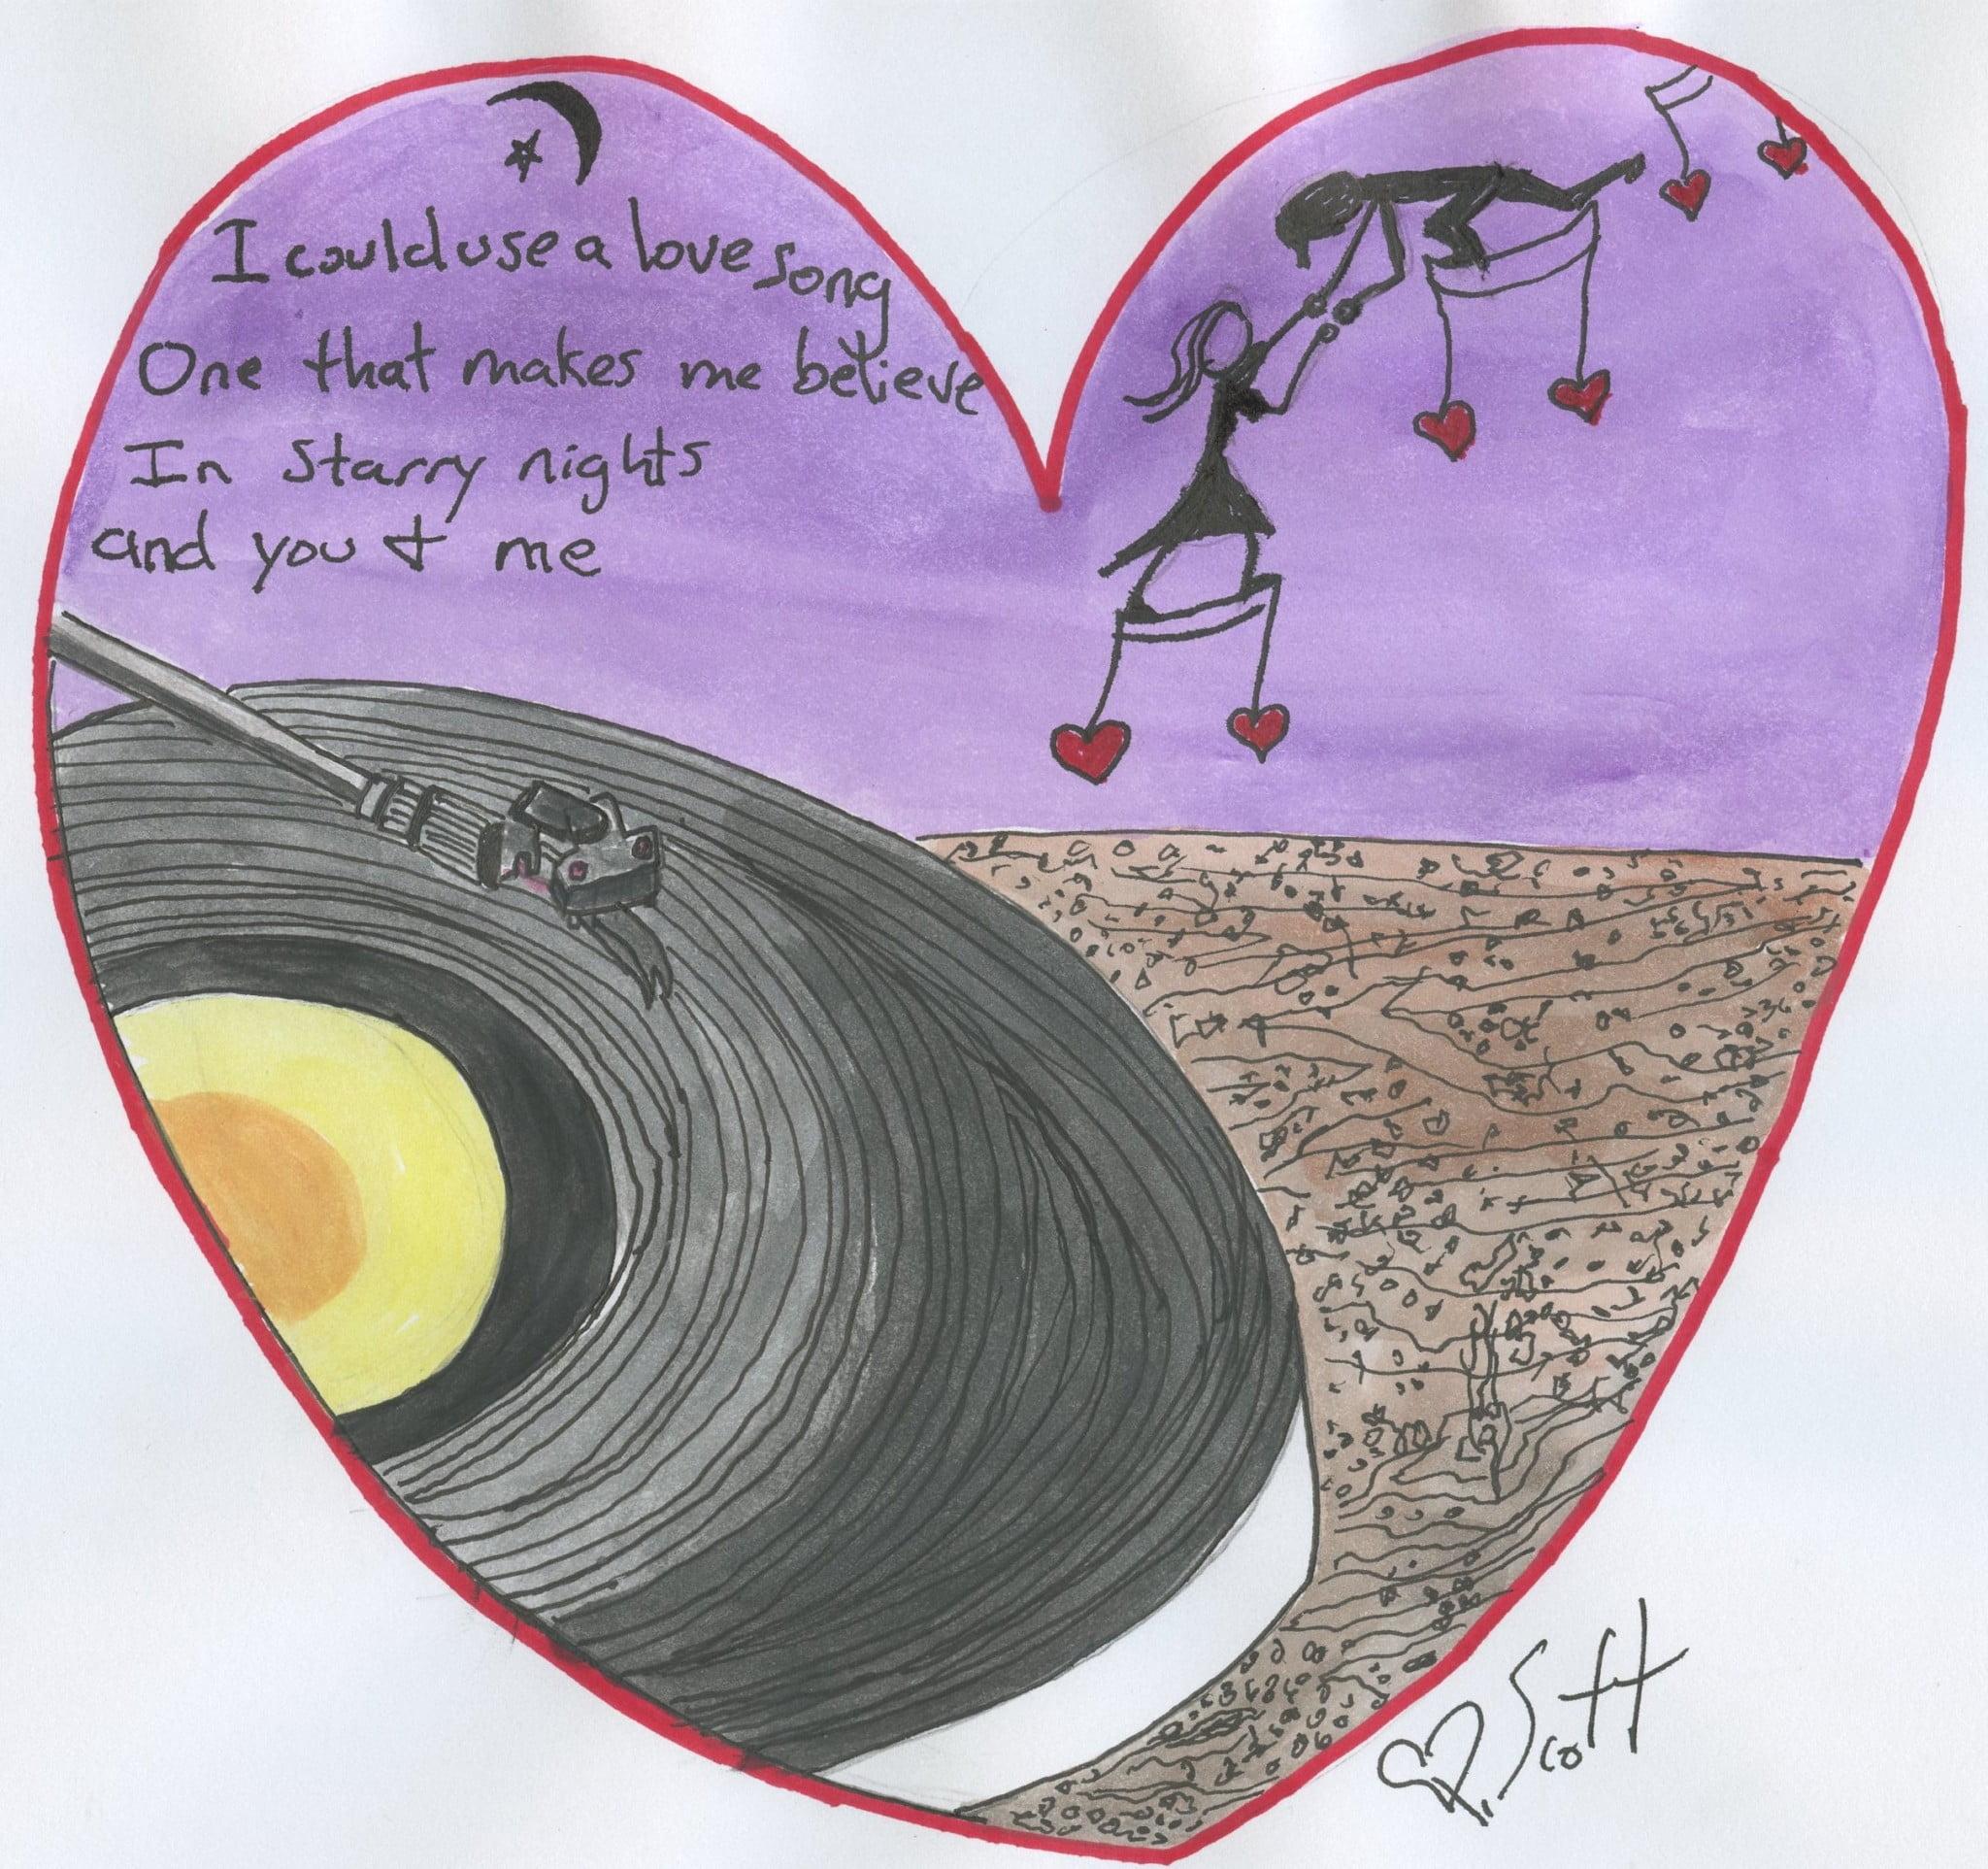 love song + heart